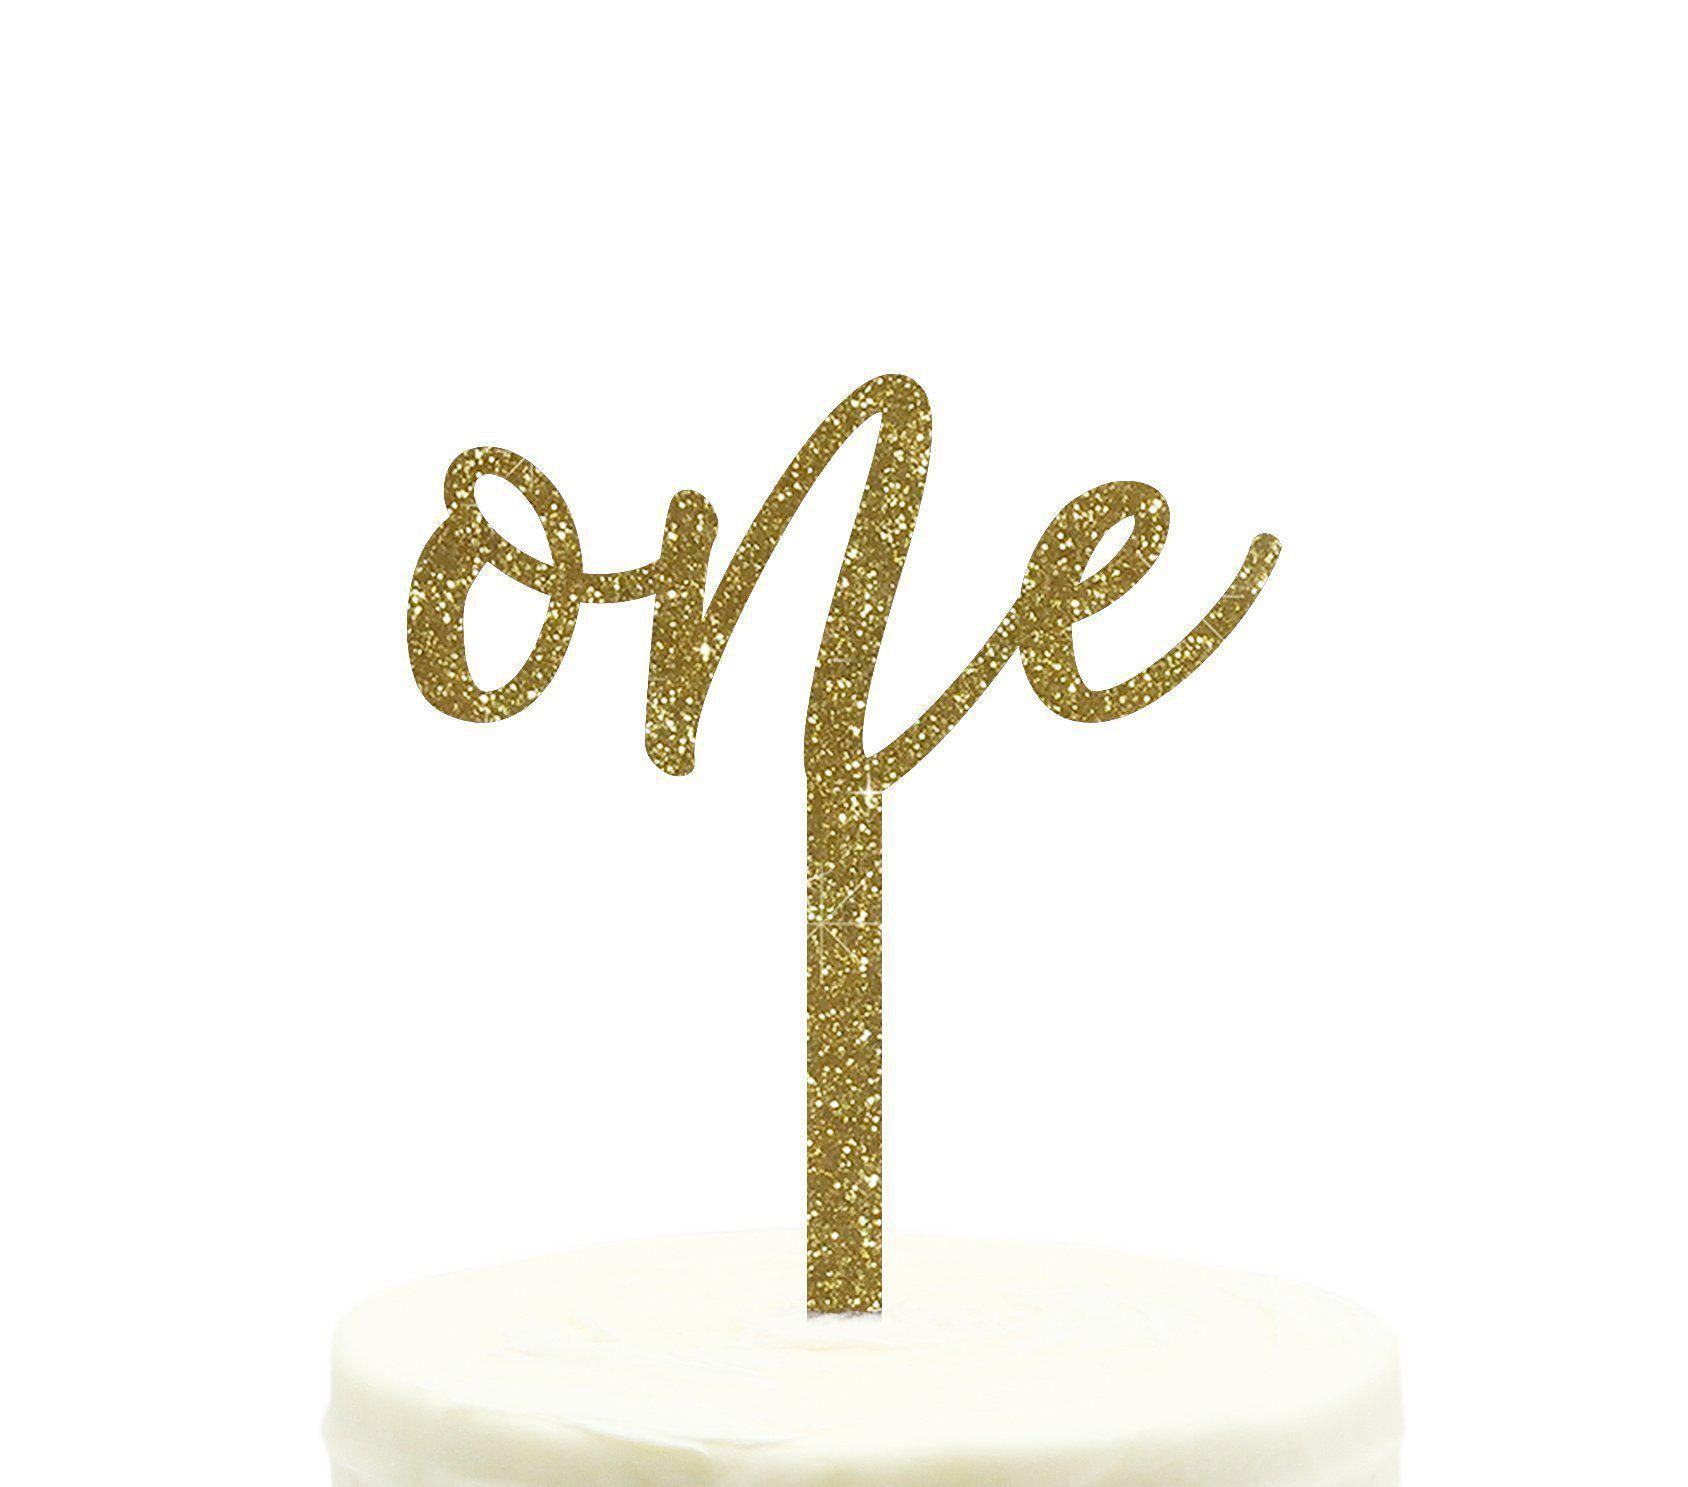 Laser Cut Cake Topper Birthday Cake Decor Gold Scripted Modern Acrylic Happy Birthday Cake Topper For Birthday Cake Birthday Parties